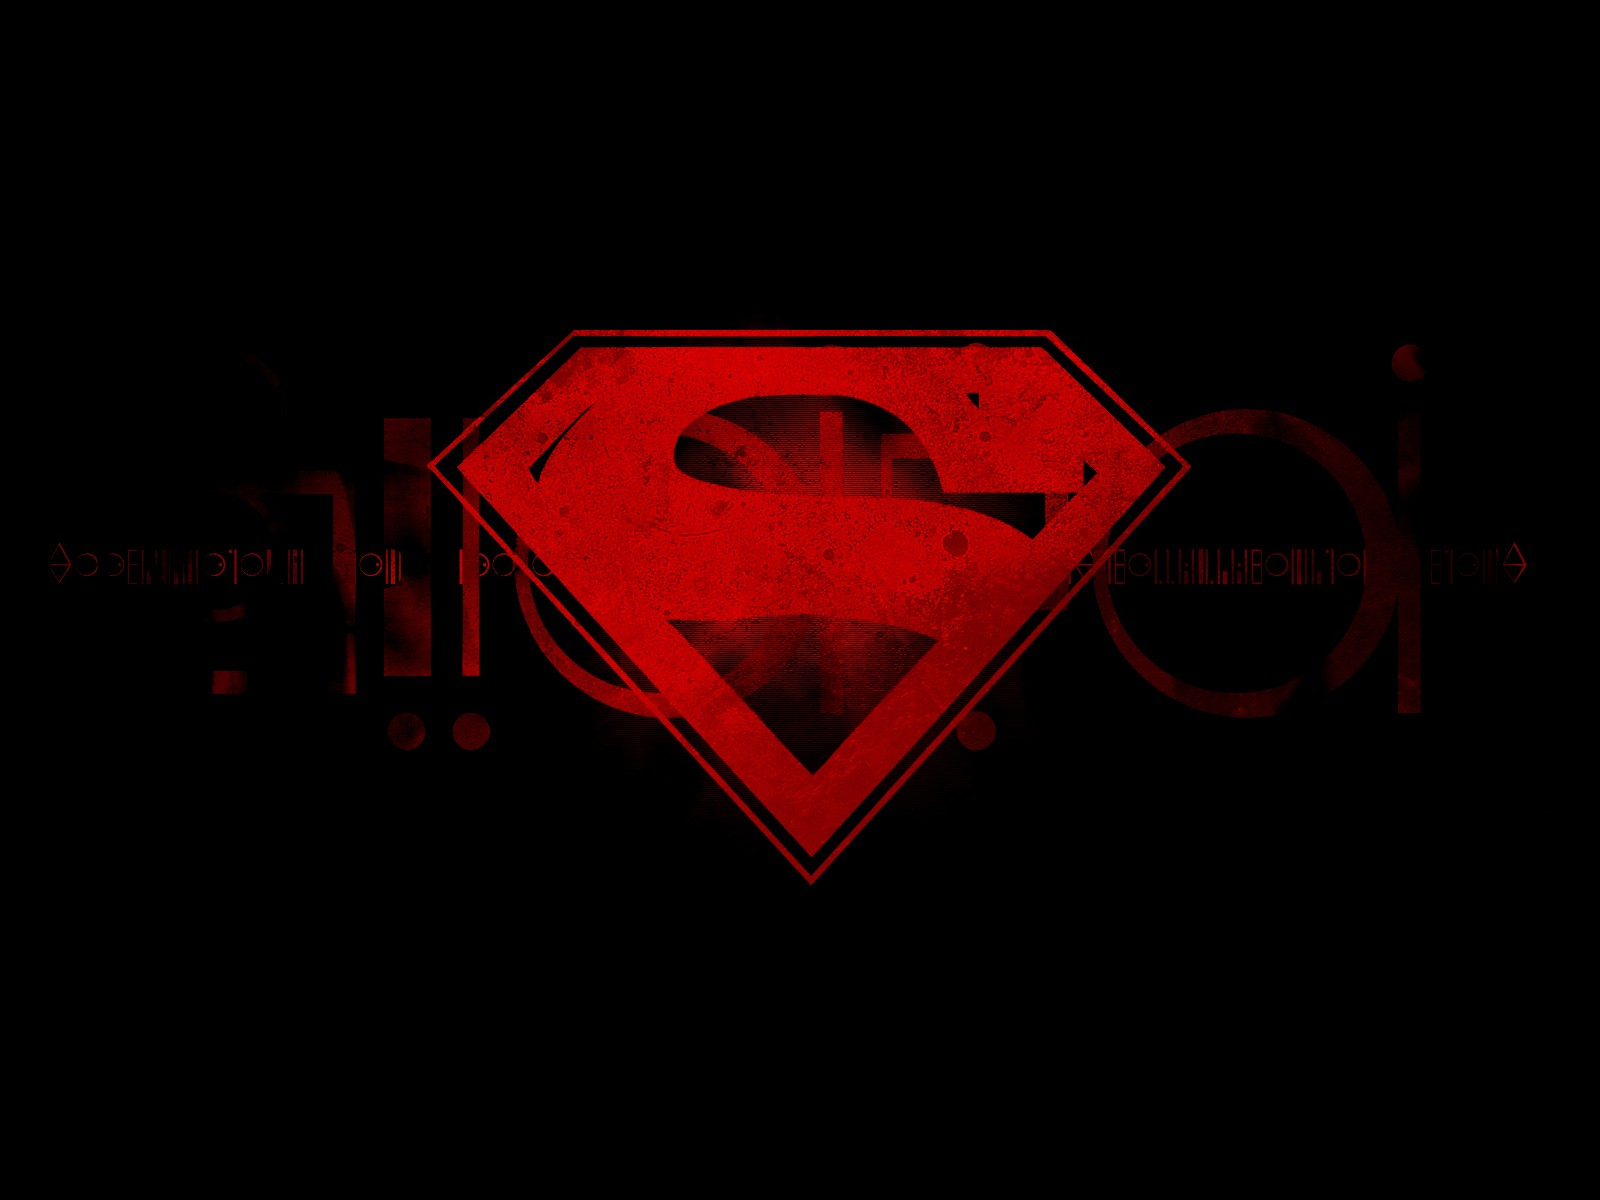 evil superman wallpaper hd - photo #26